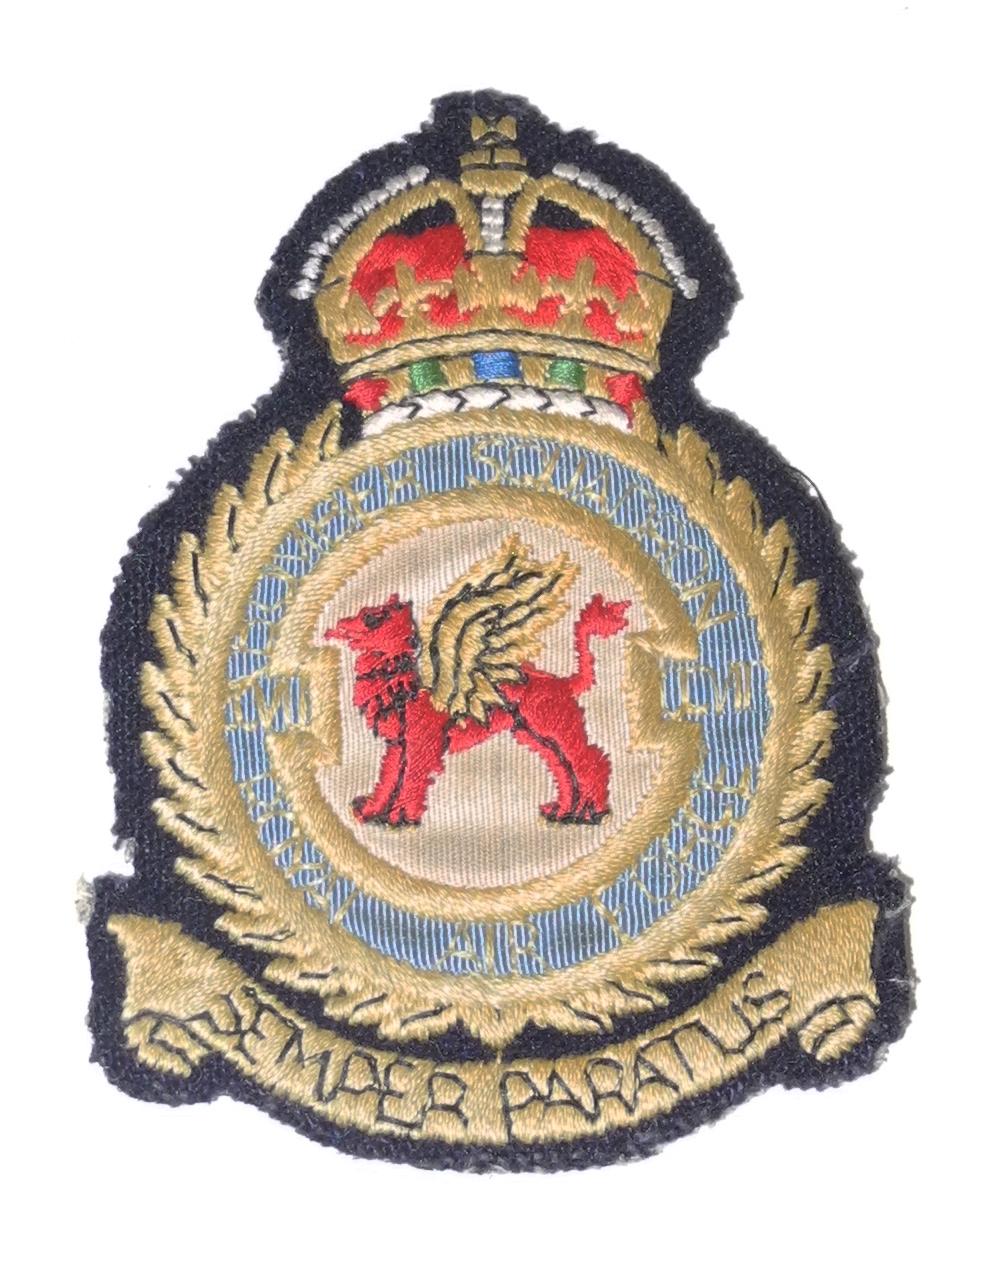 WWII RAF 207 squadron patch - $125